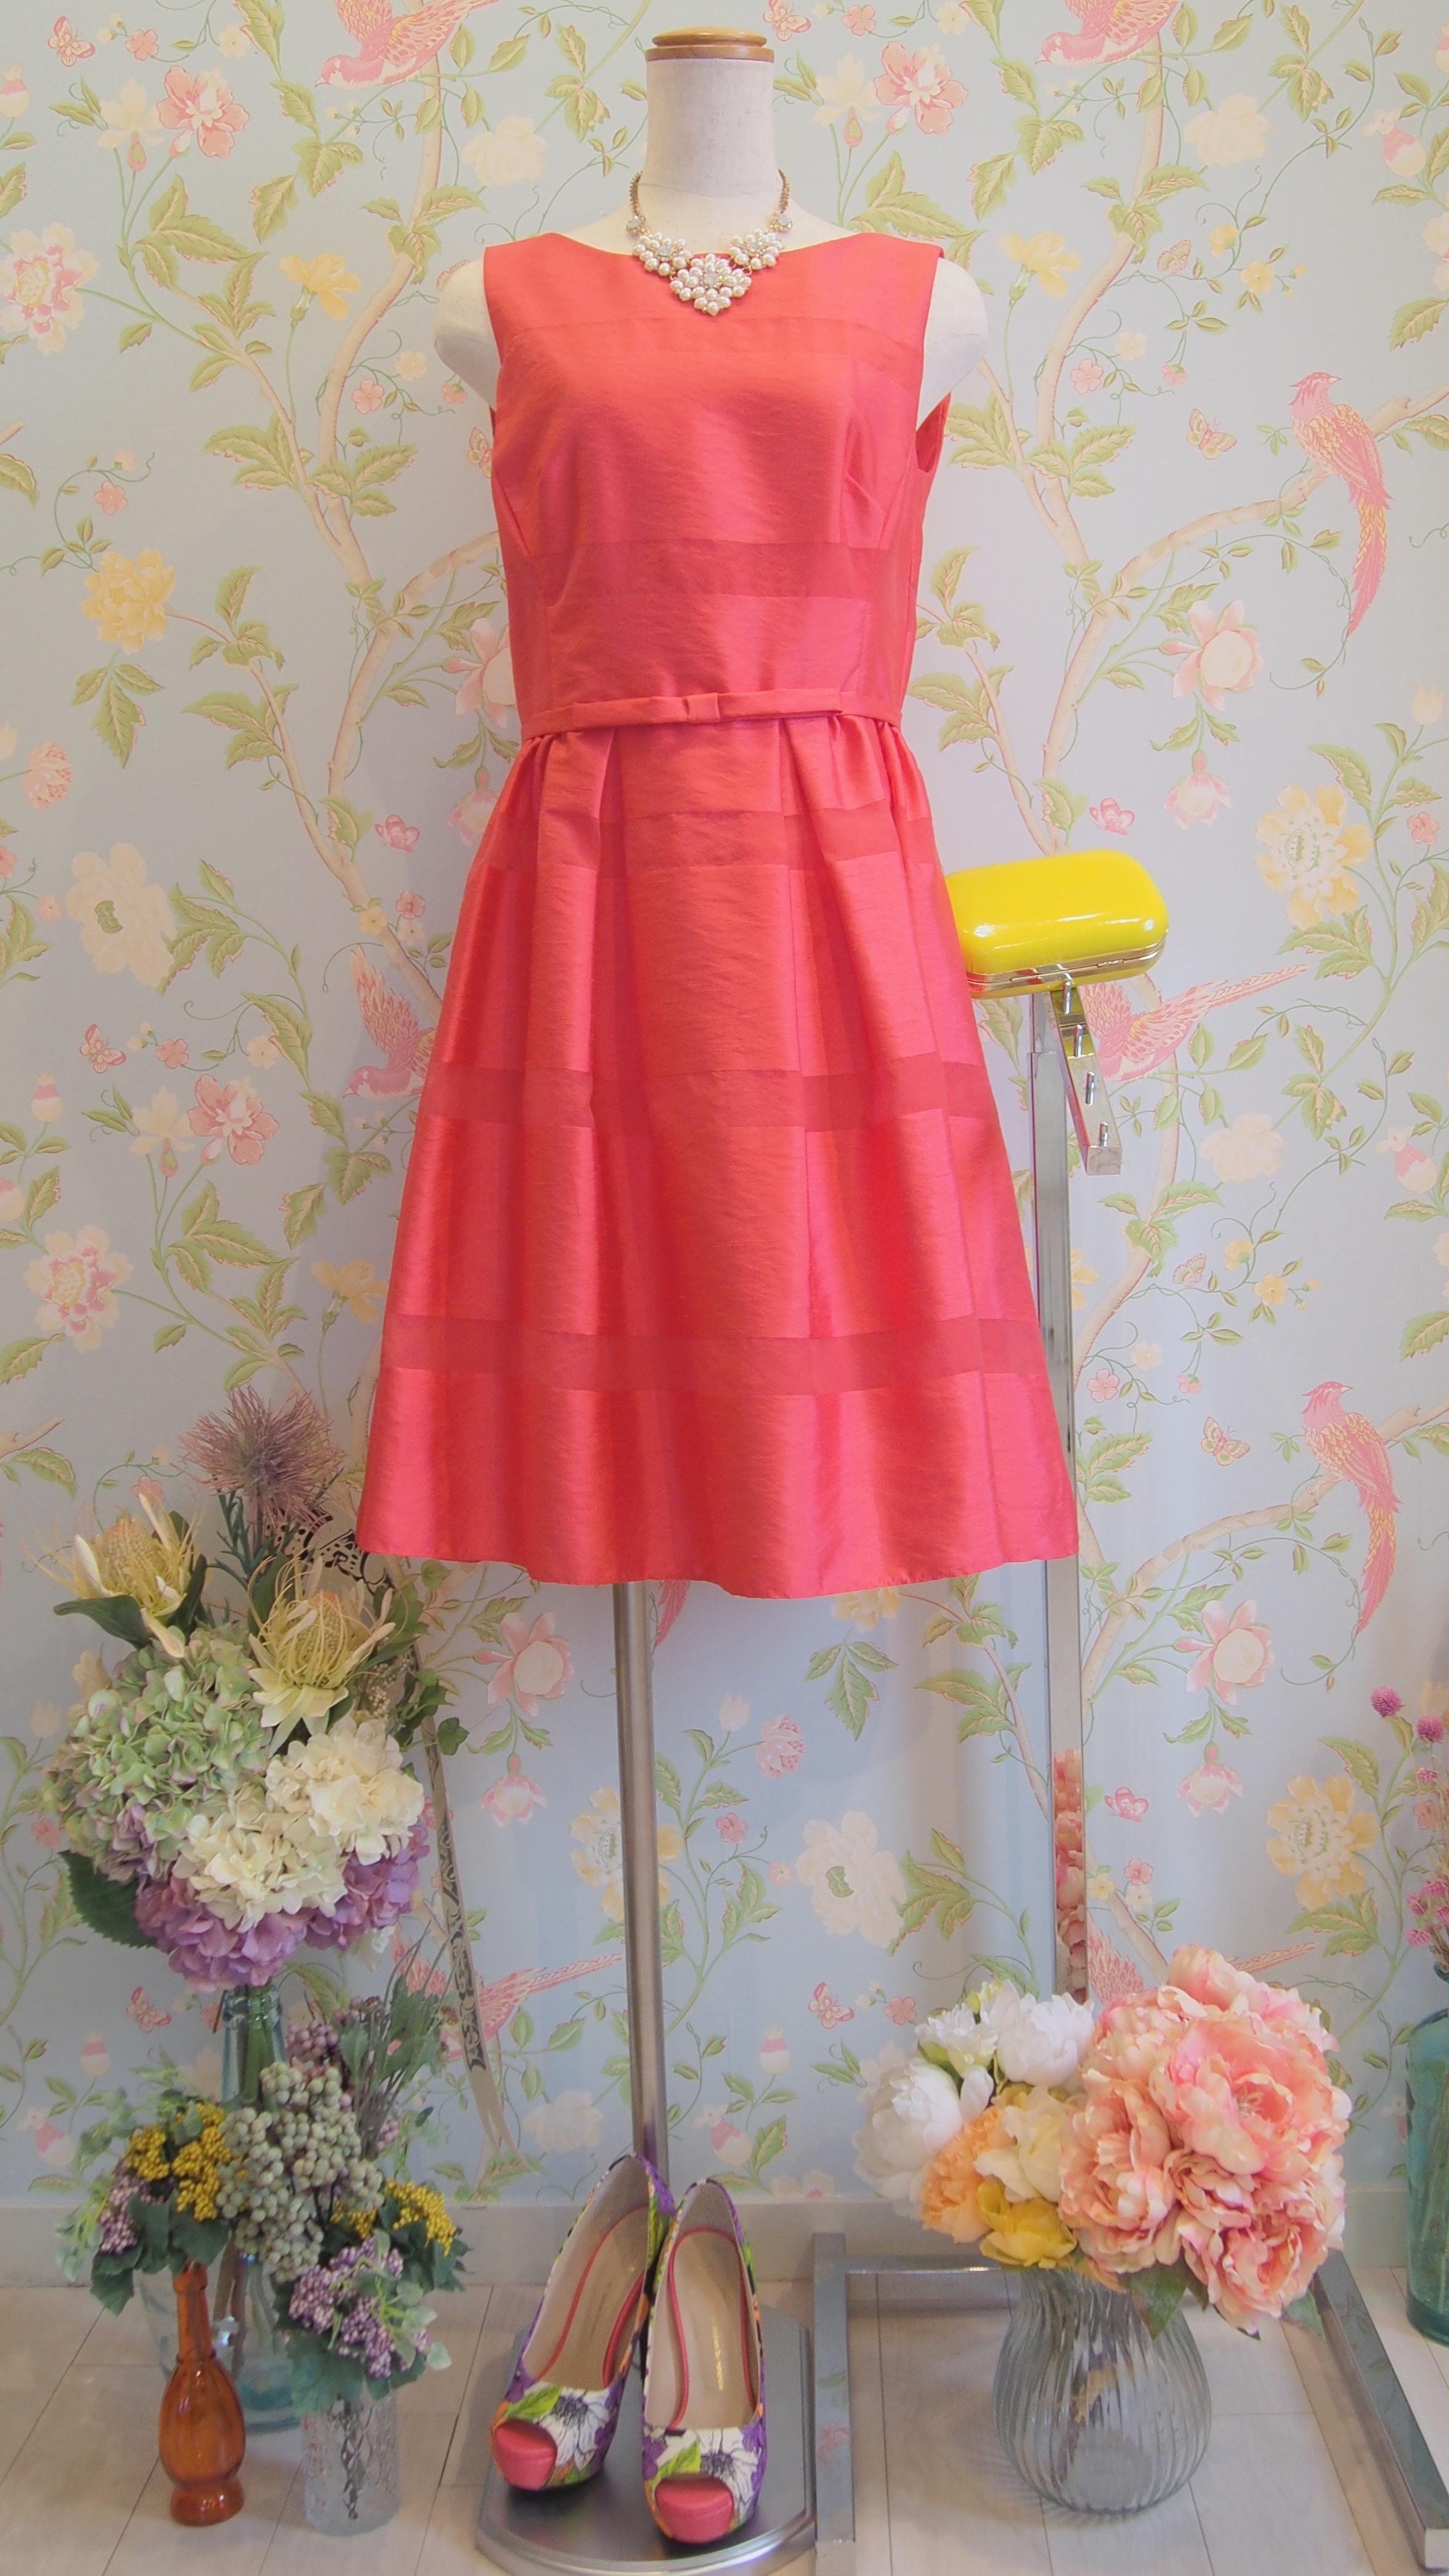 nr_dress_393